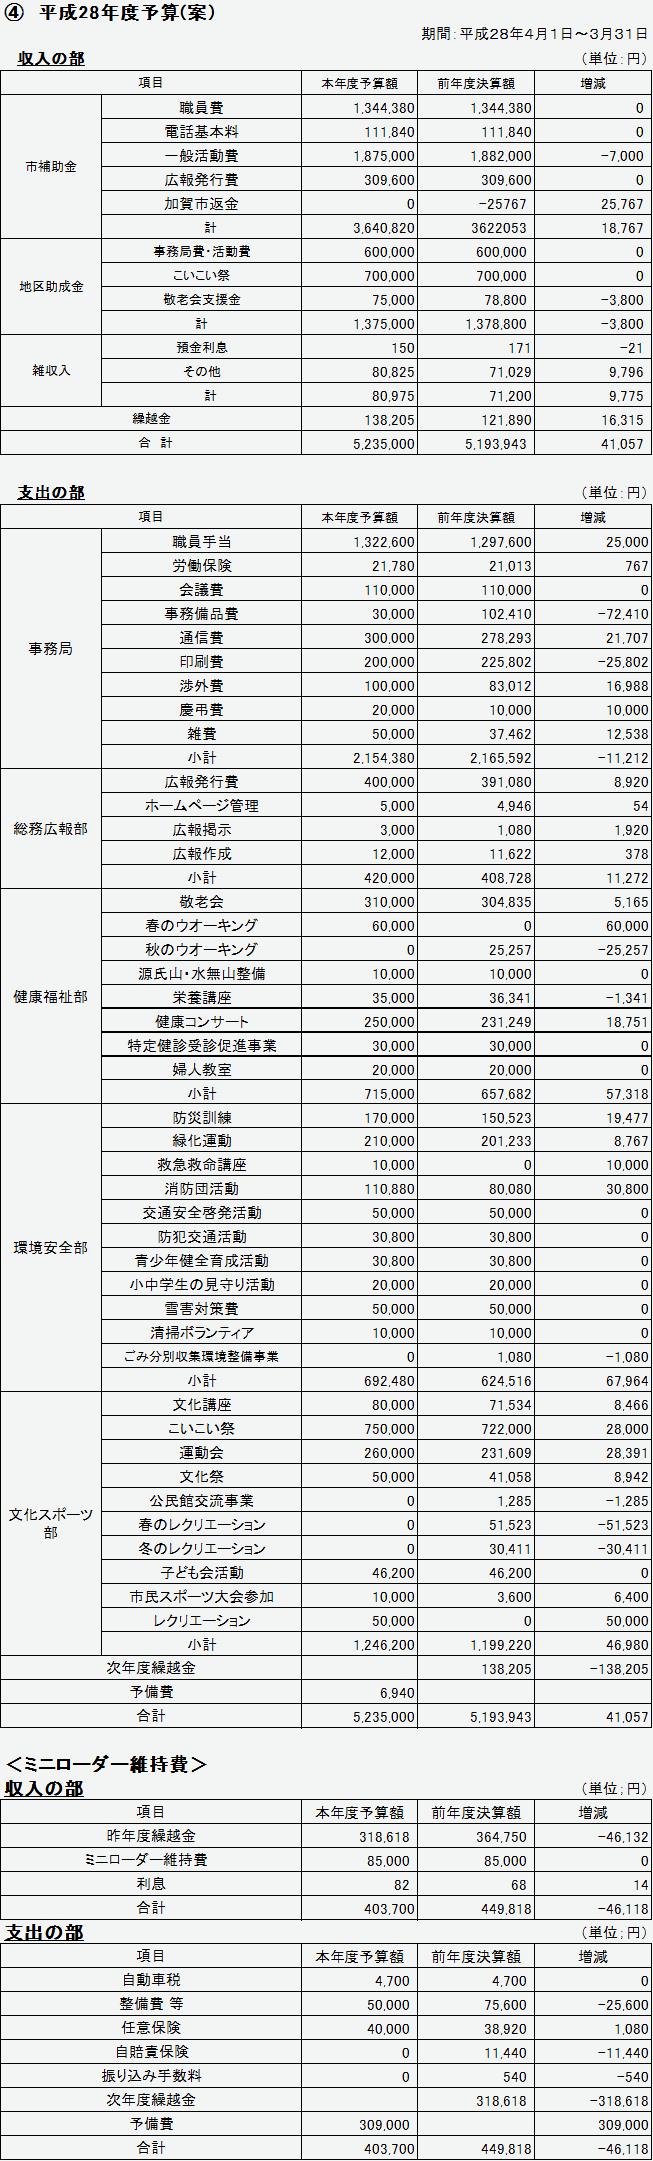 ④H28年度予算.png